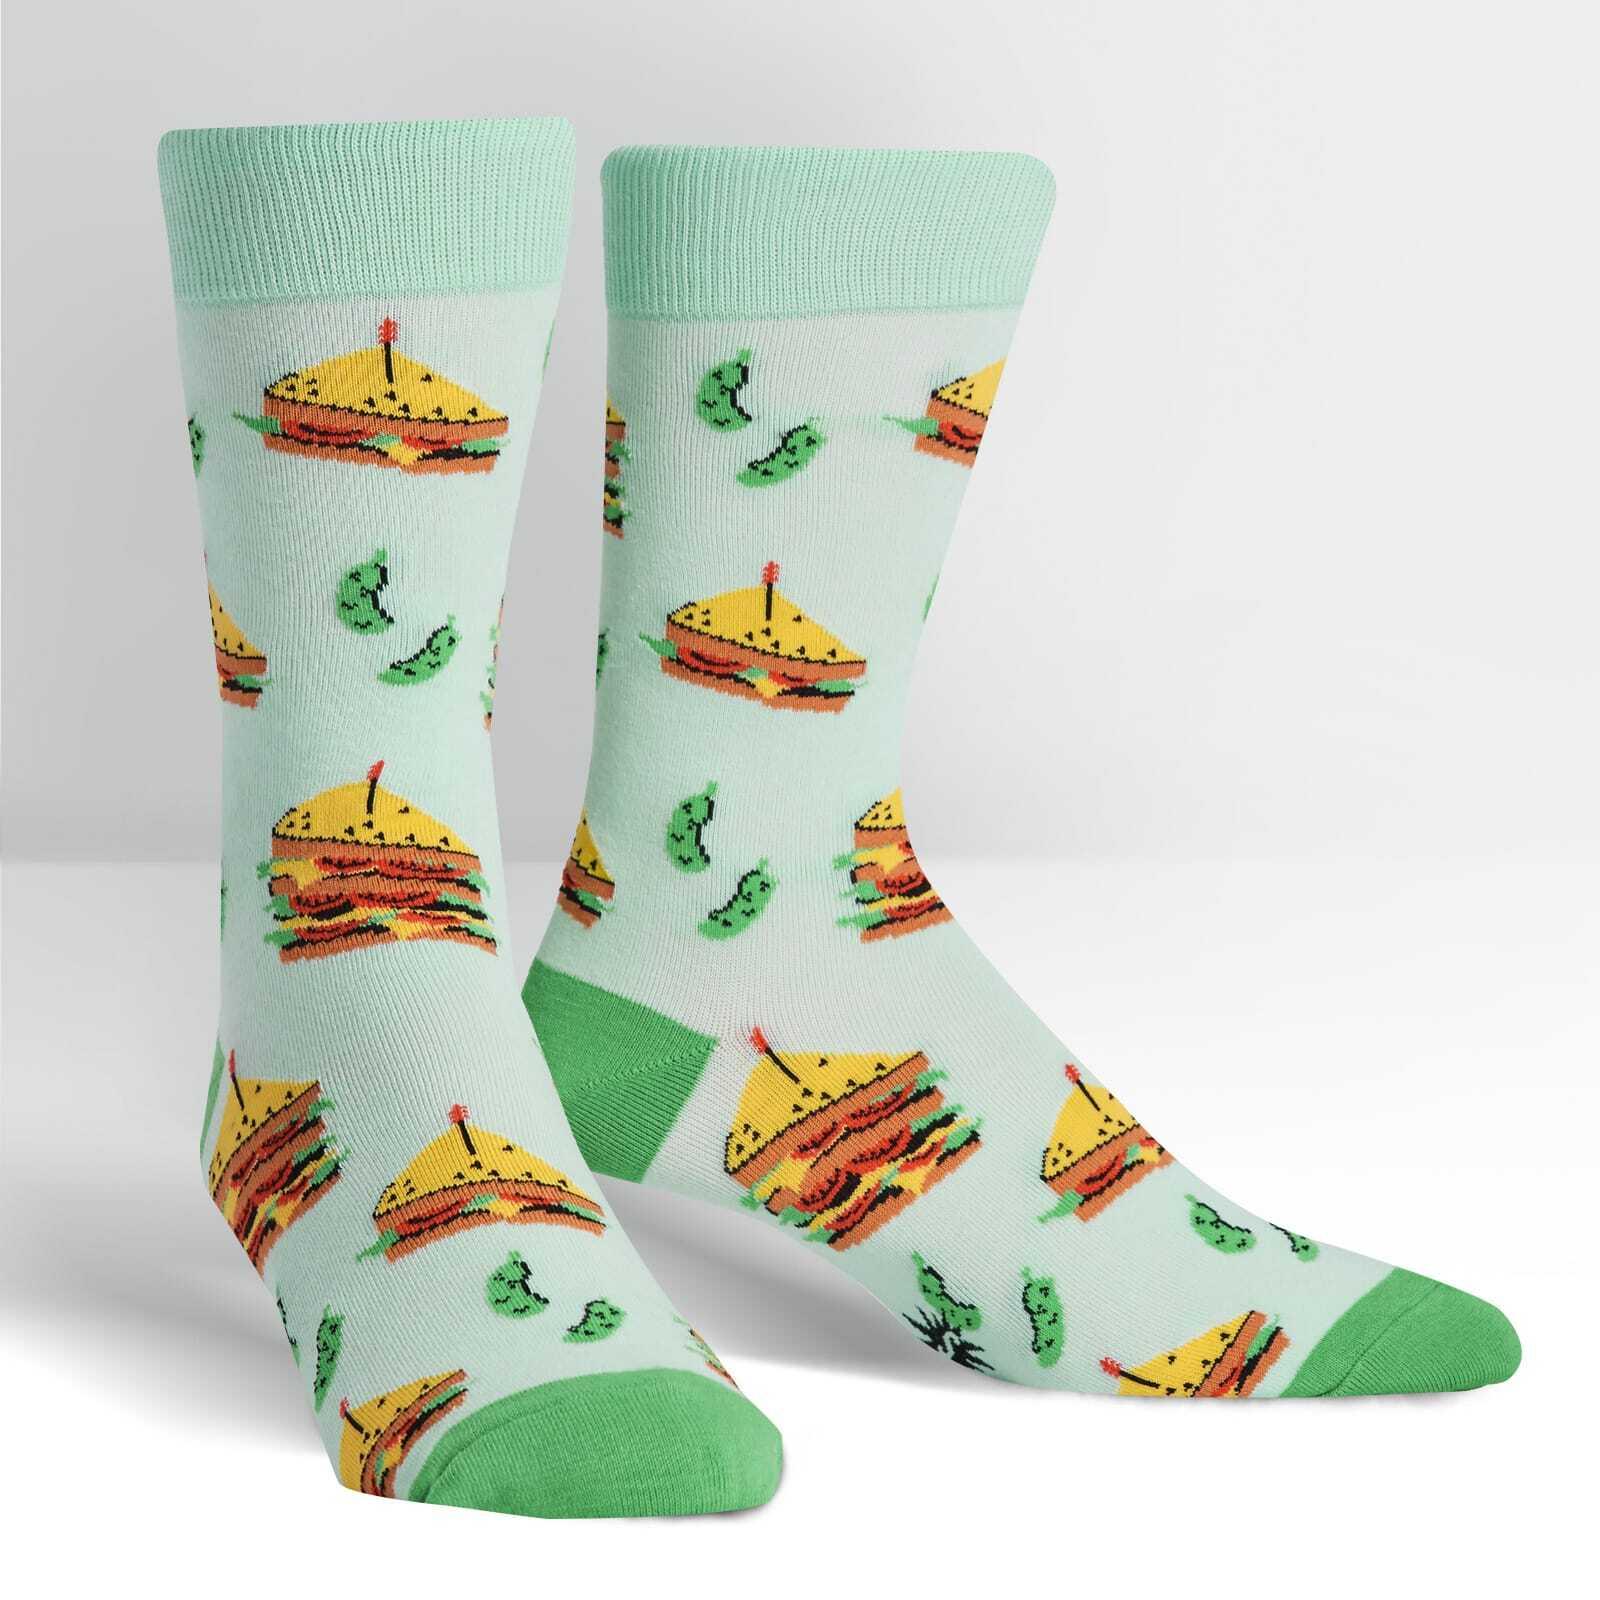 Join the Club - Favorite Sandwich Teal Aqua Men's Crew Socks - Sock It to Me in Teal